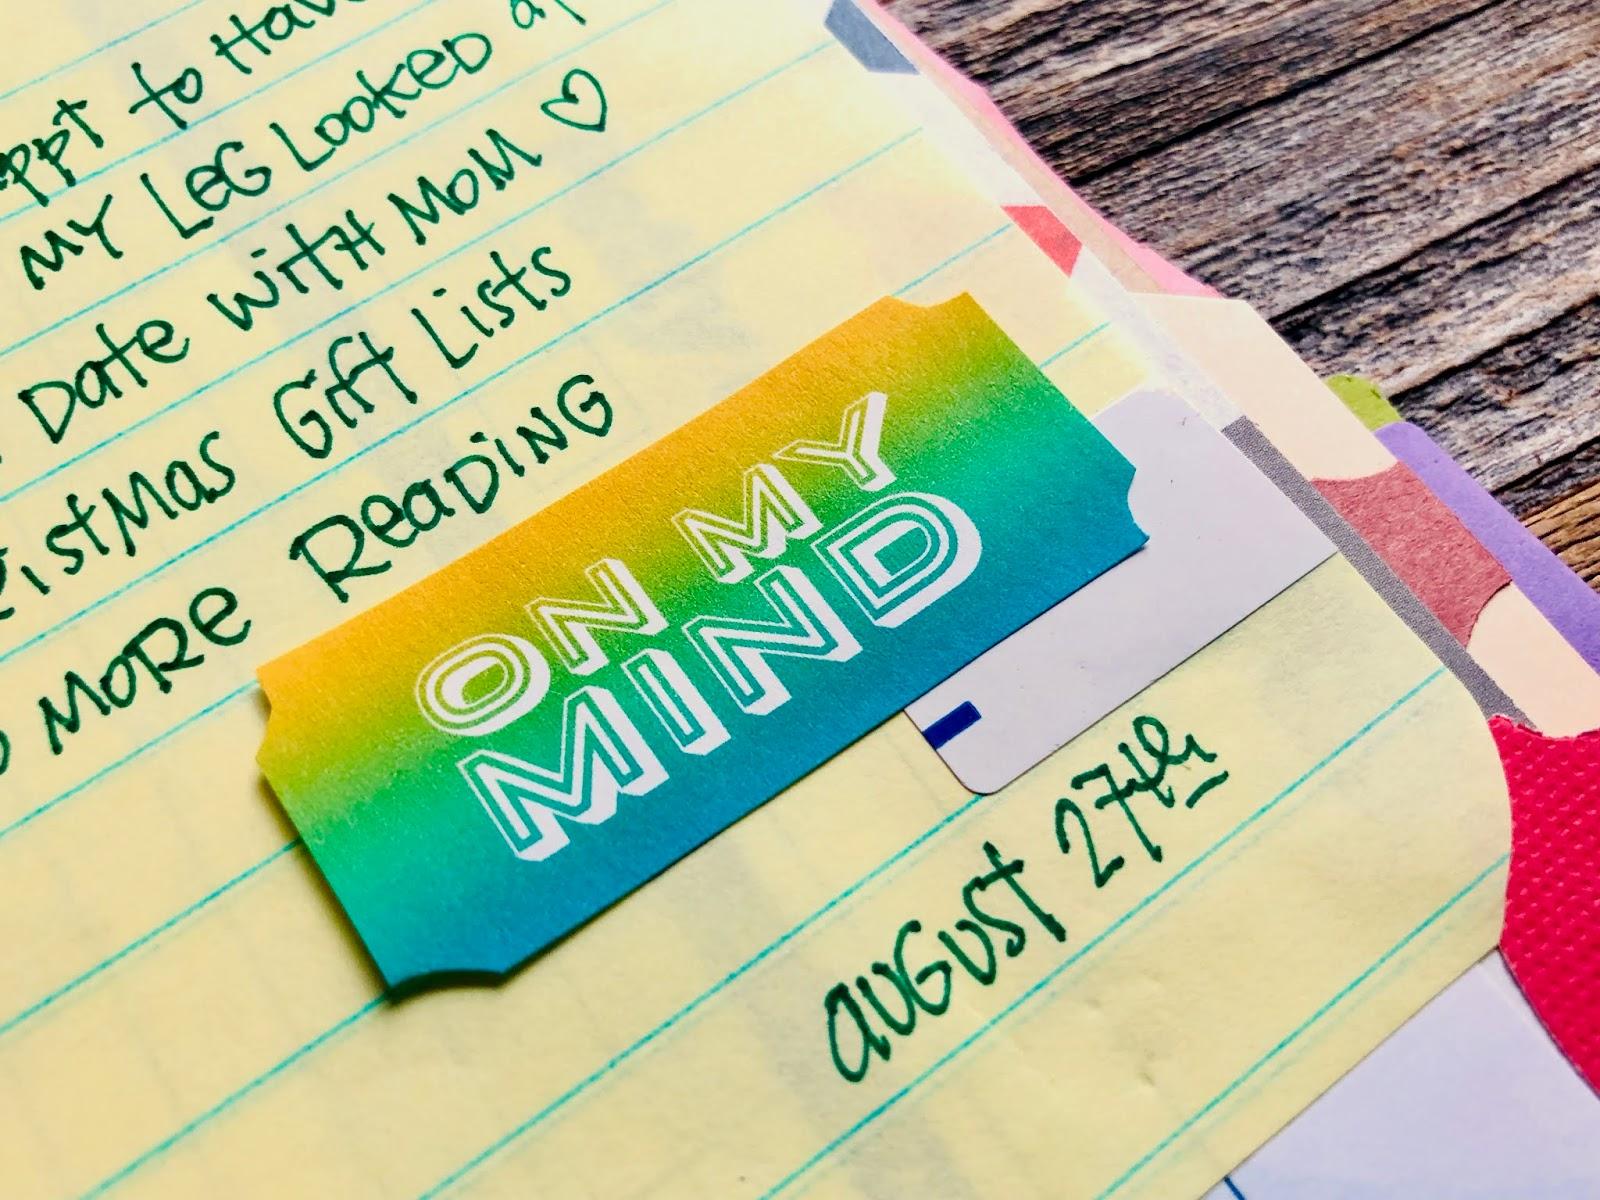 #gratitude journal #gratitude #on my mind #printables #printable #thankful journal #journaling #i am thankful